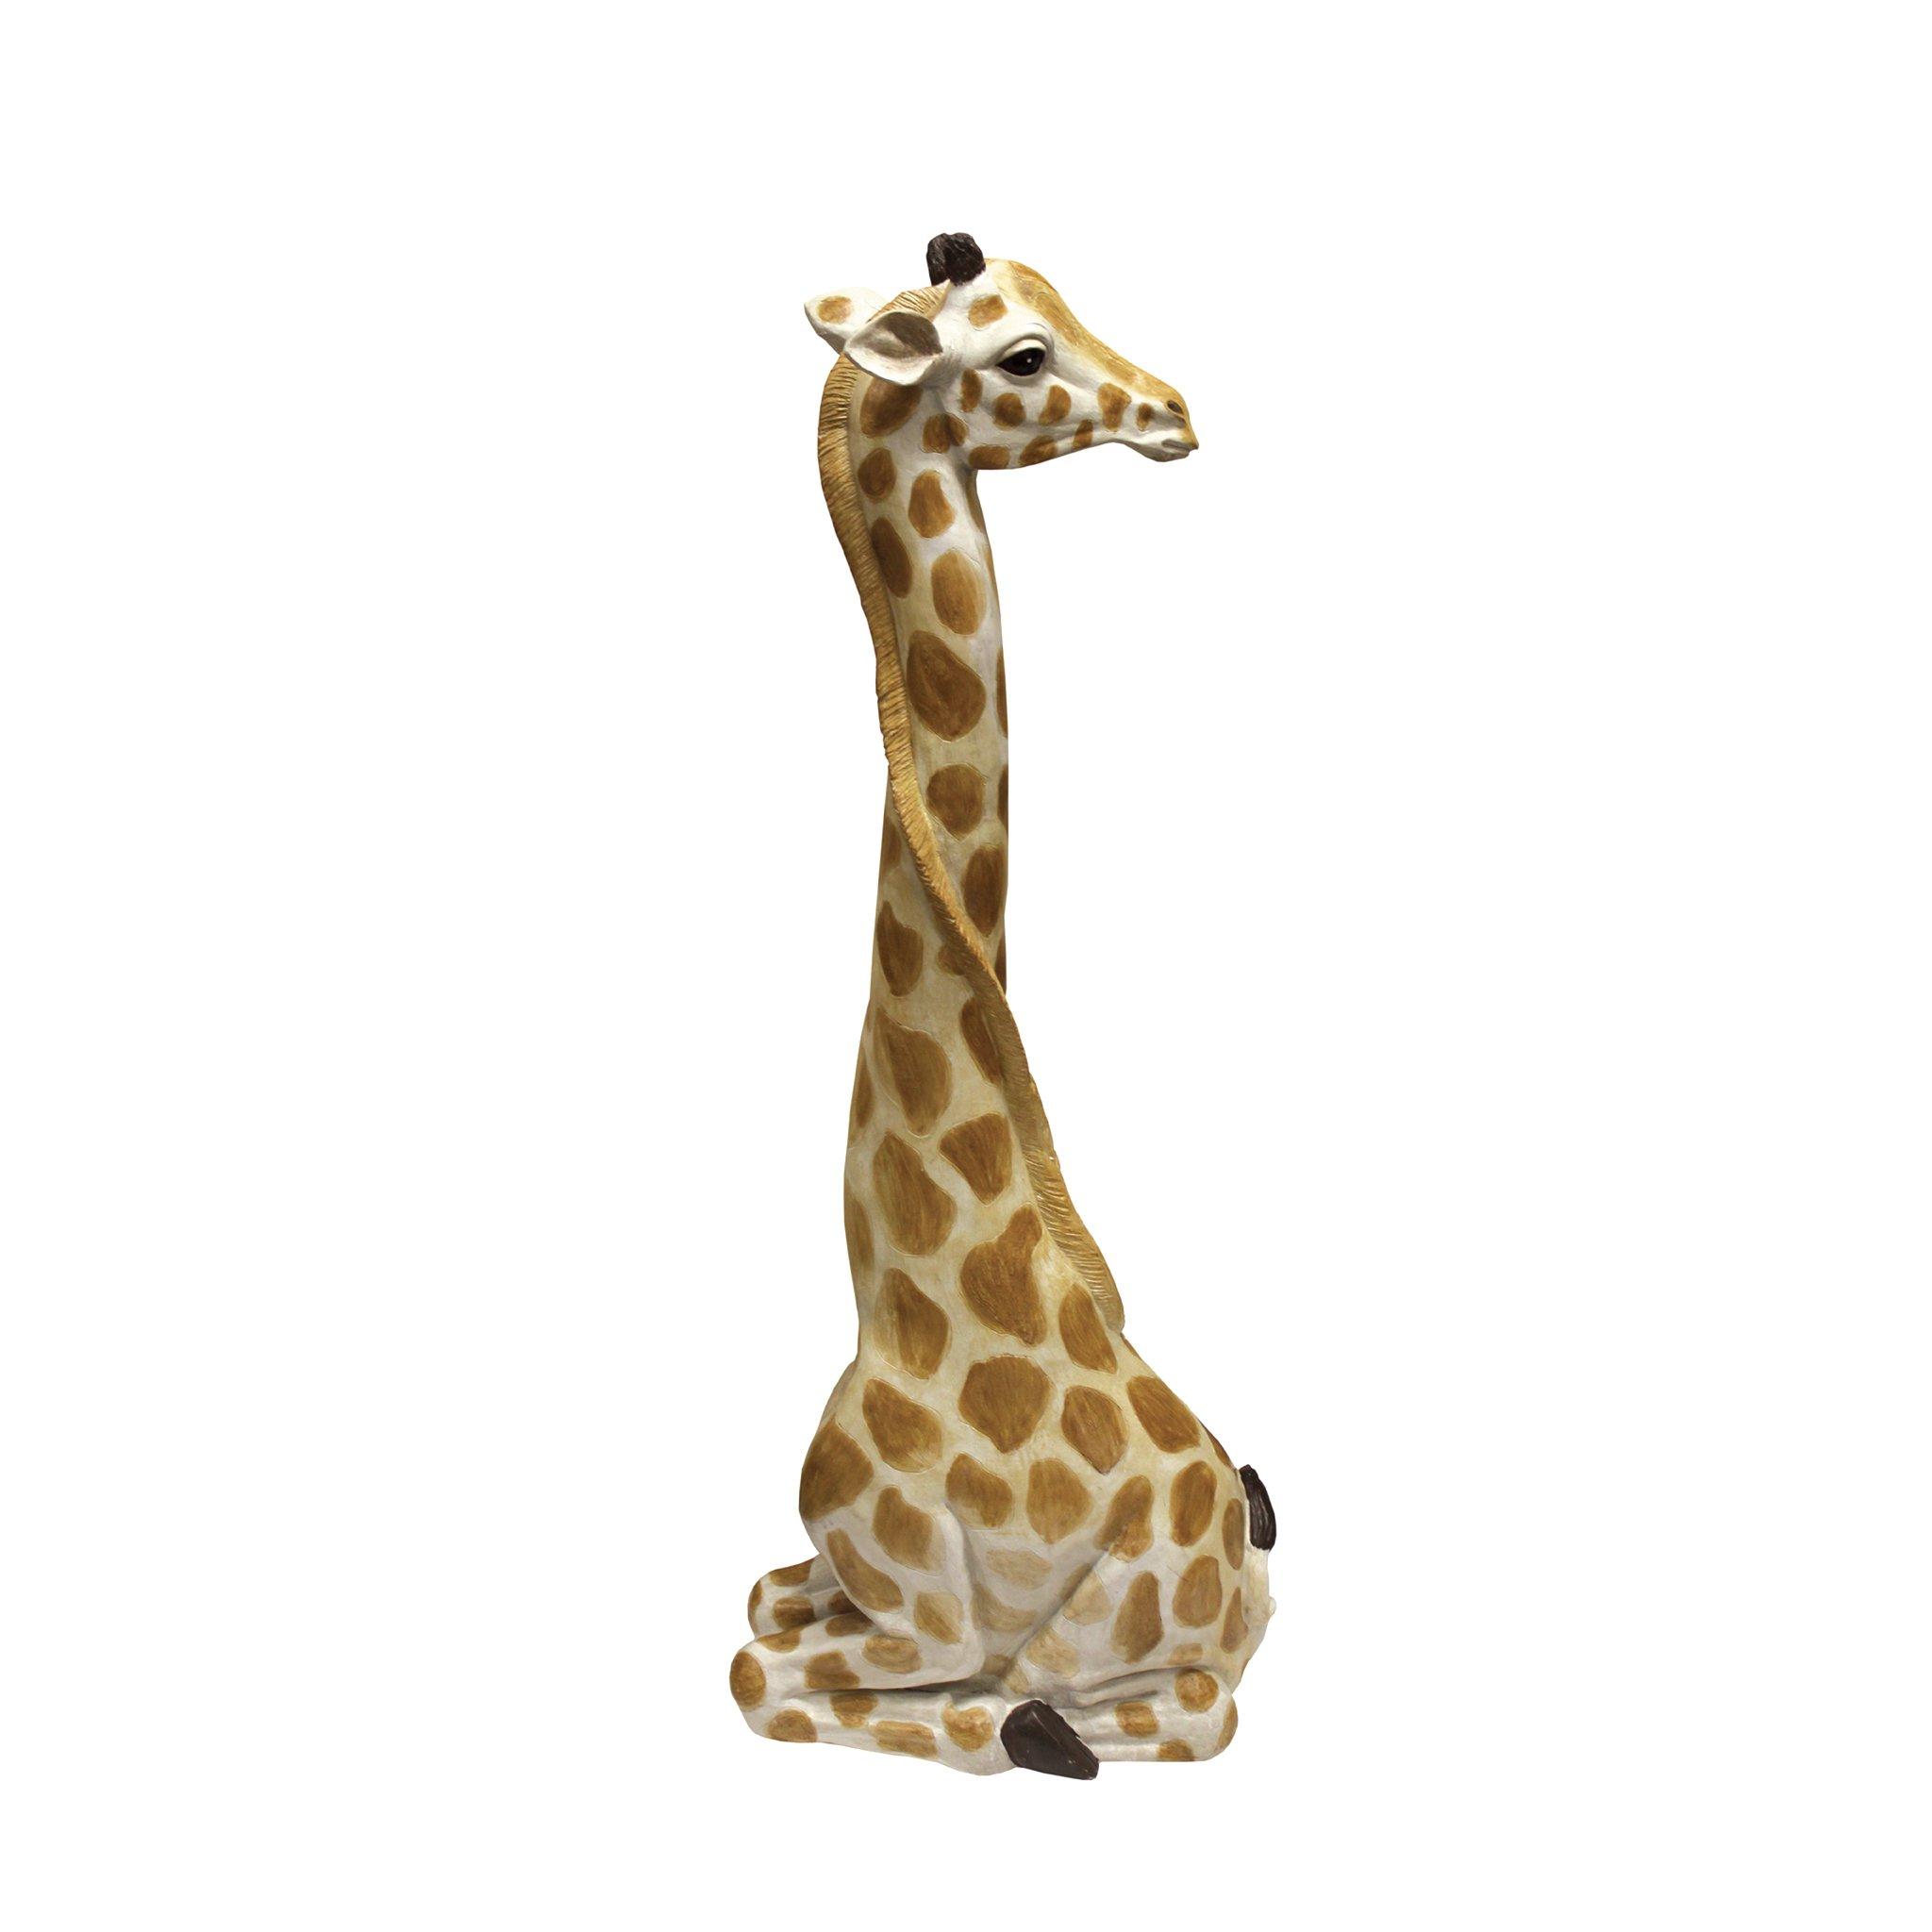 Design Toscano Gigi the Garden Giraffe Statue by Design Toscano